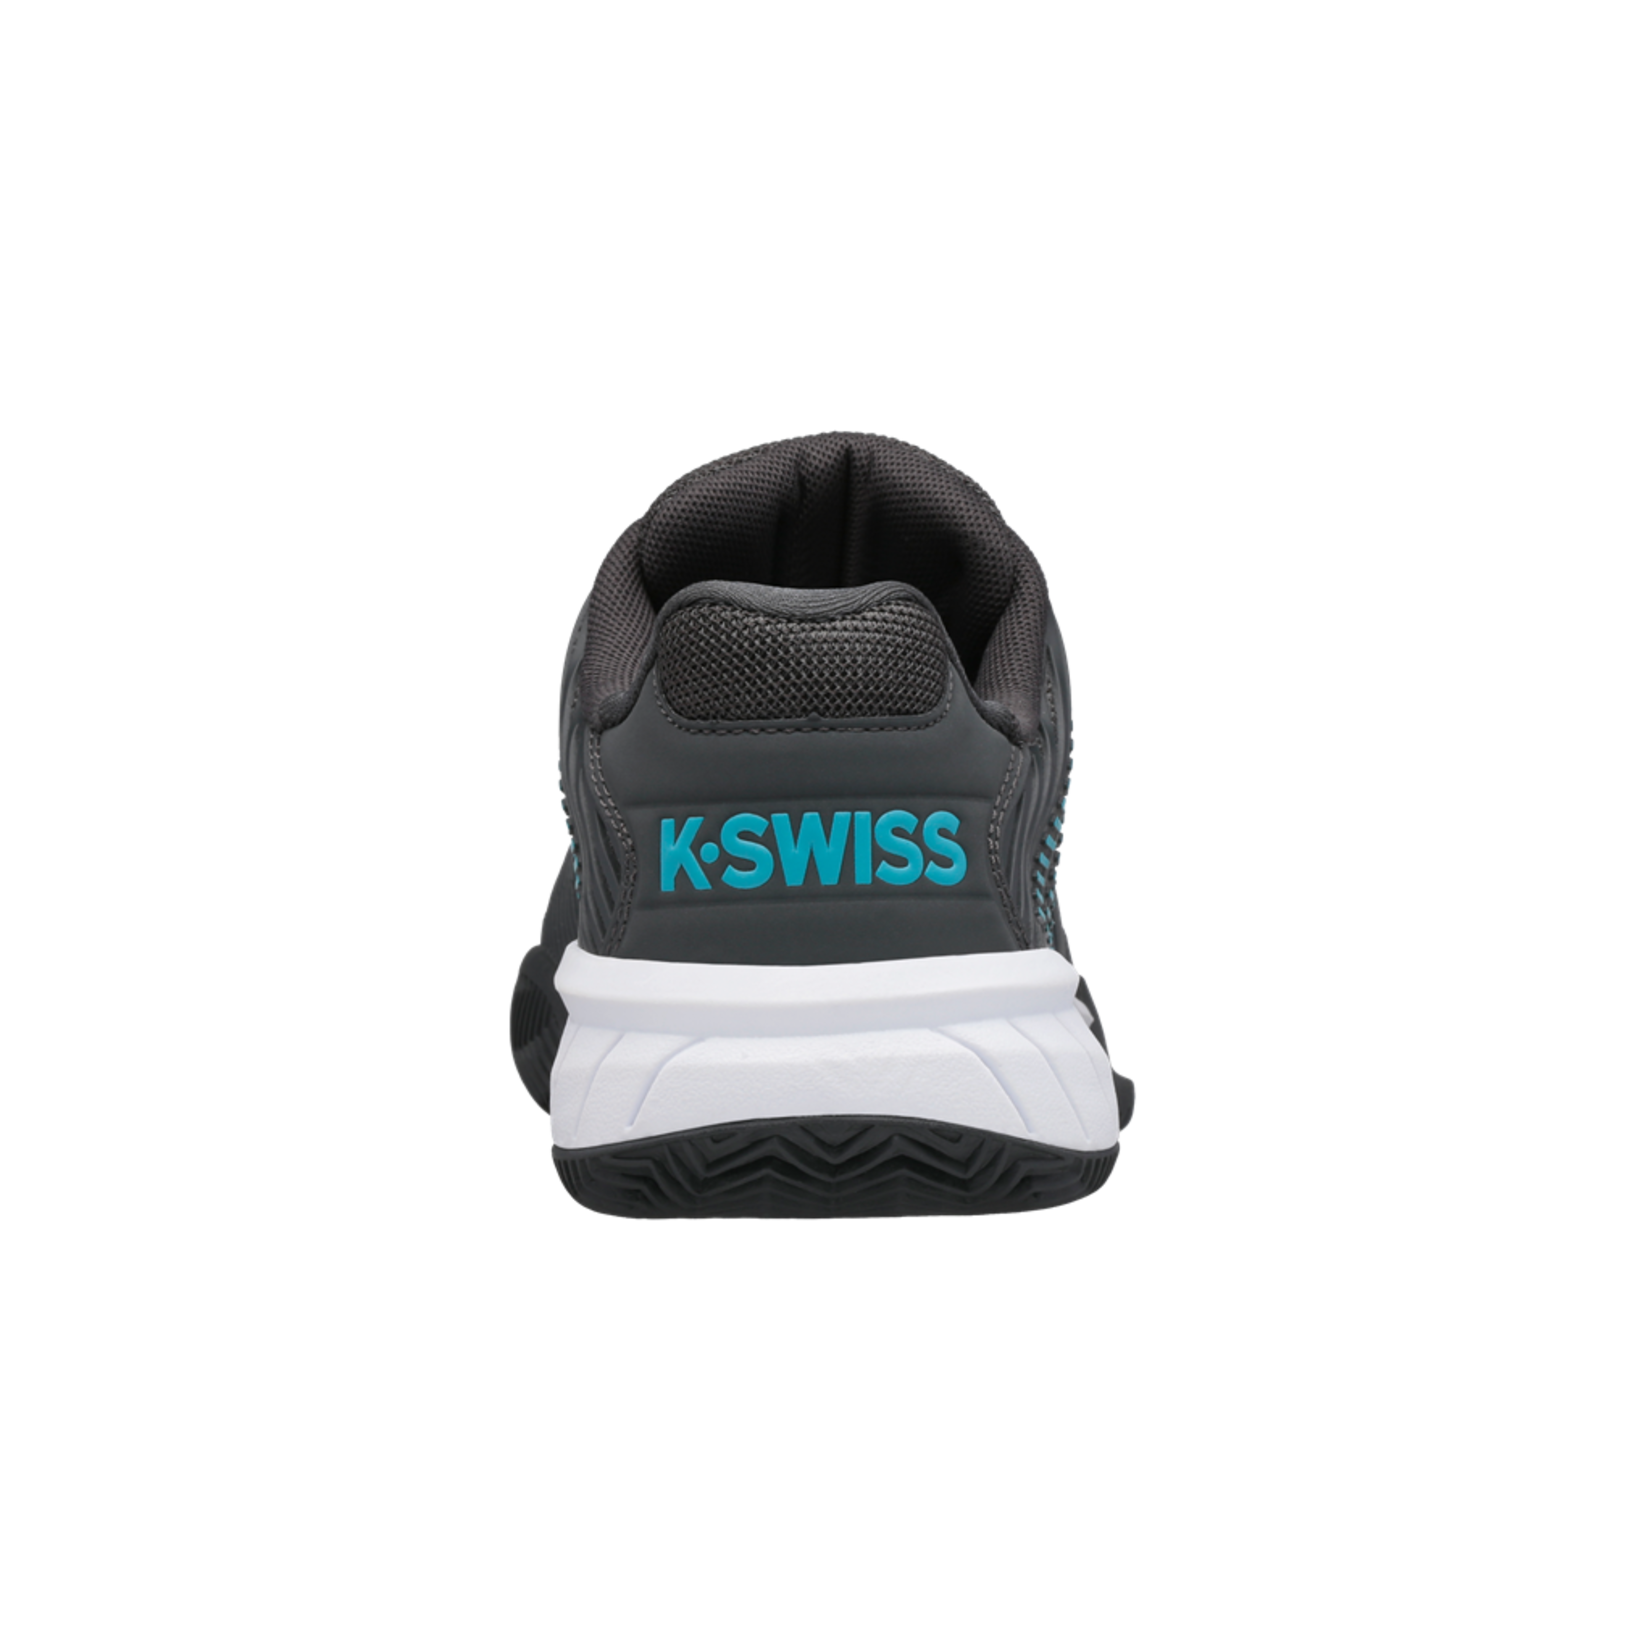 K-Swiss Jeugd - Hypercourt Express Clay